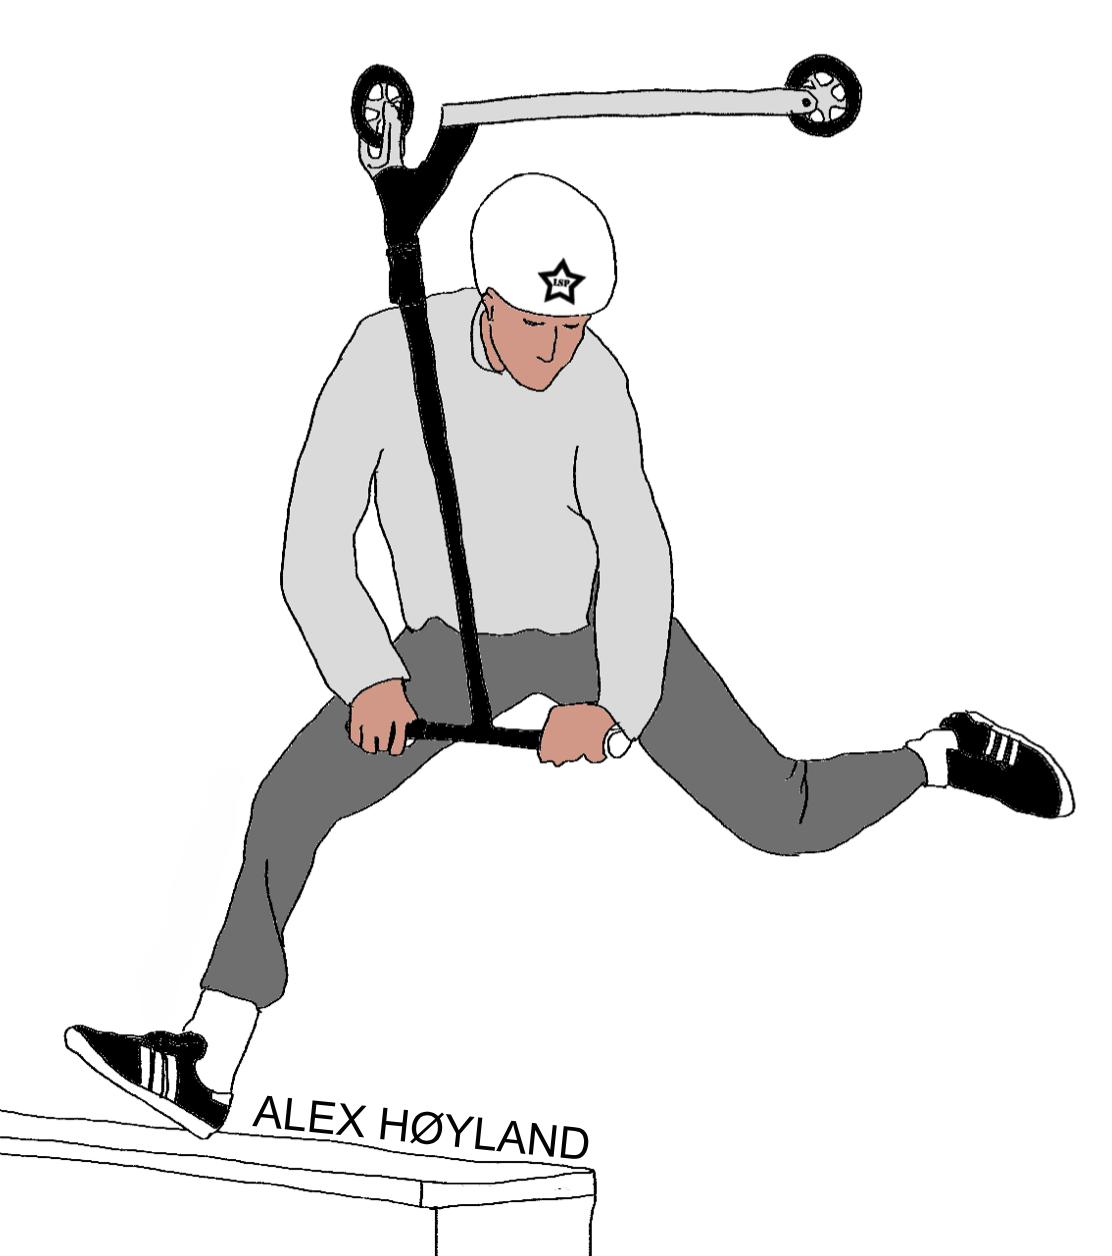 Alex Høyland Klistremerke 2020